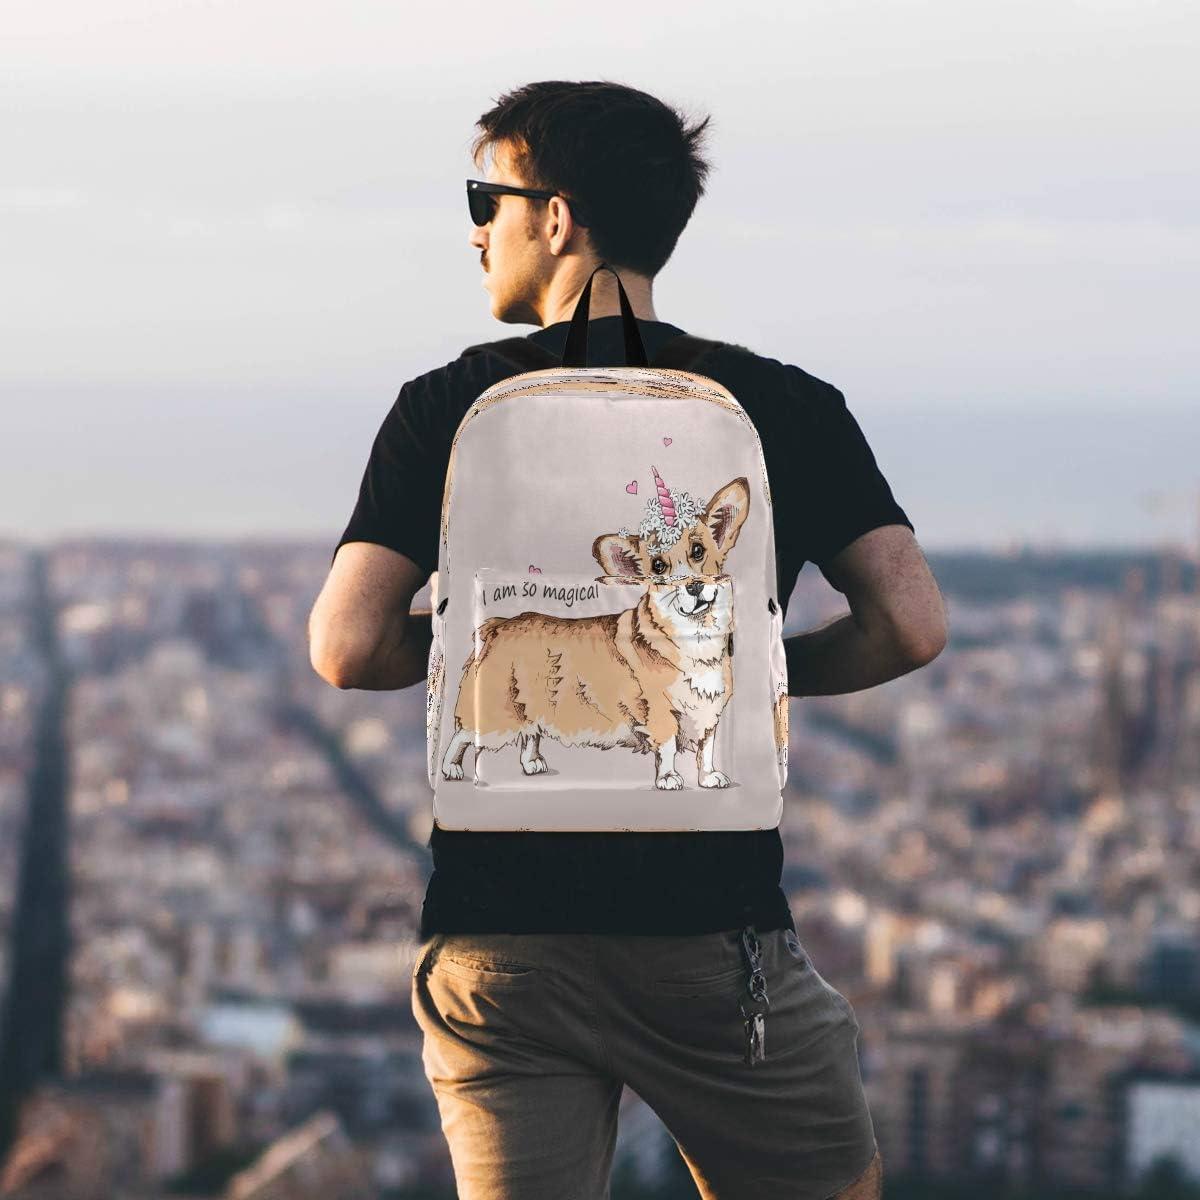 Unicorn Dog Laptop Backpack Bookbag Puppy Pug Pet Heart Travel Backpacks Casual Daypack Workbag Shoulders Bag Sports Bags for Women Men Working Hiking Outdoor